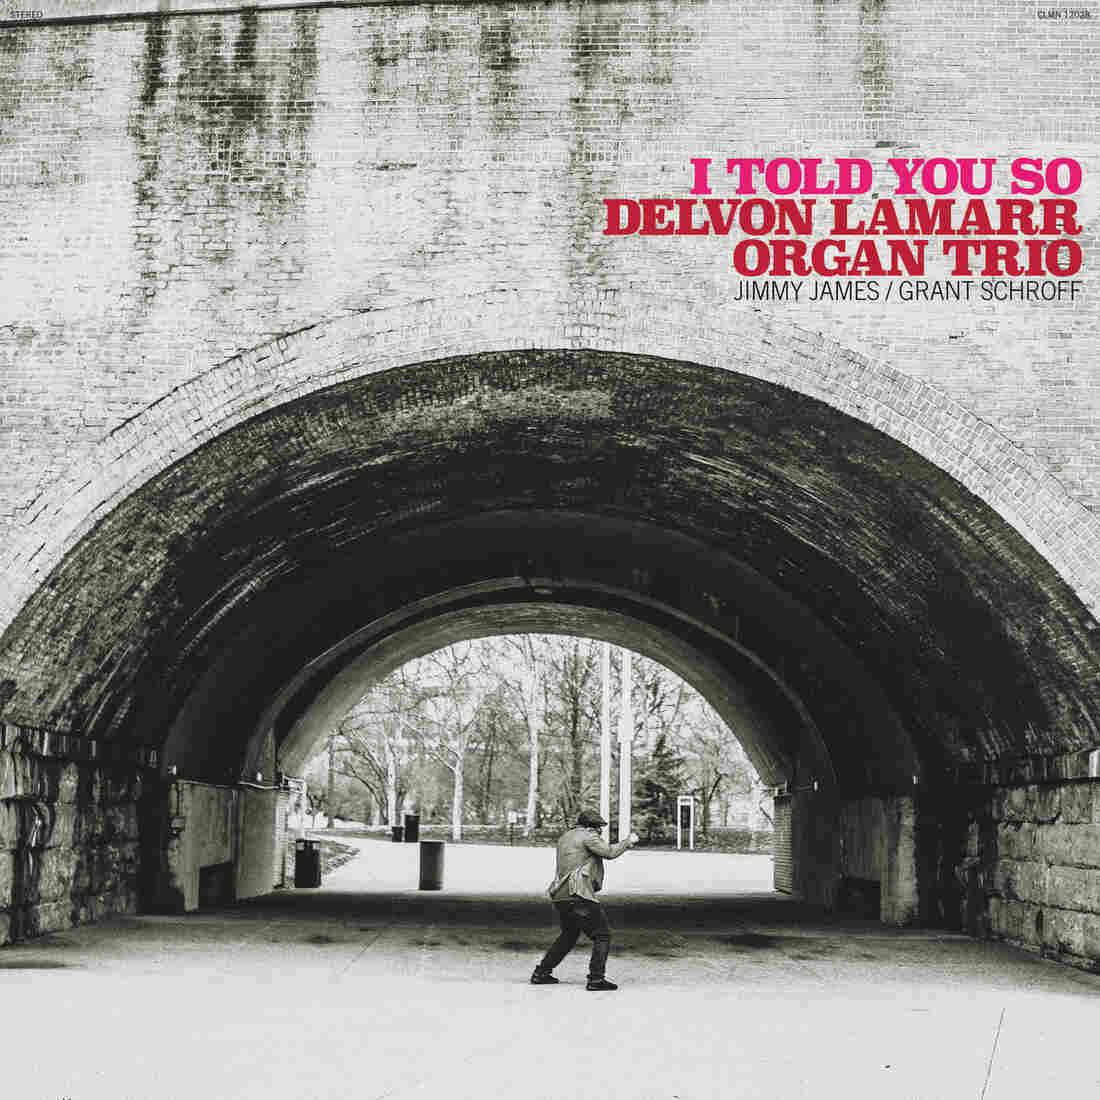 Delvon Lamarr Organ Trio, I Told You So